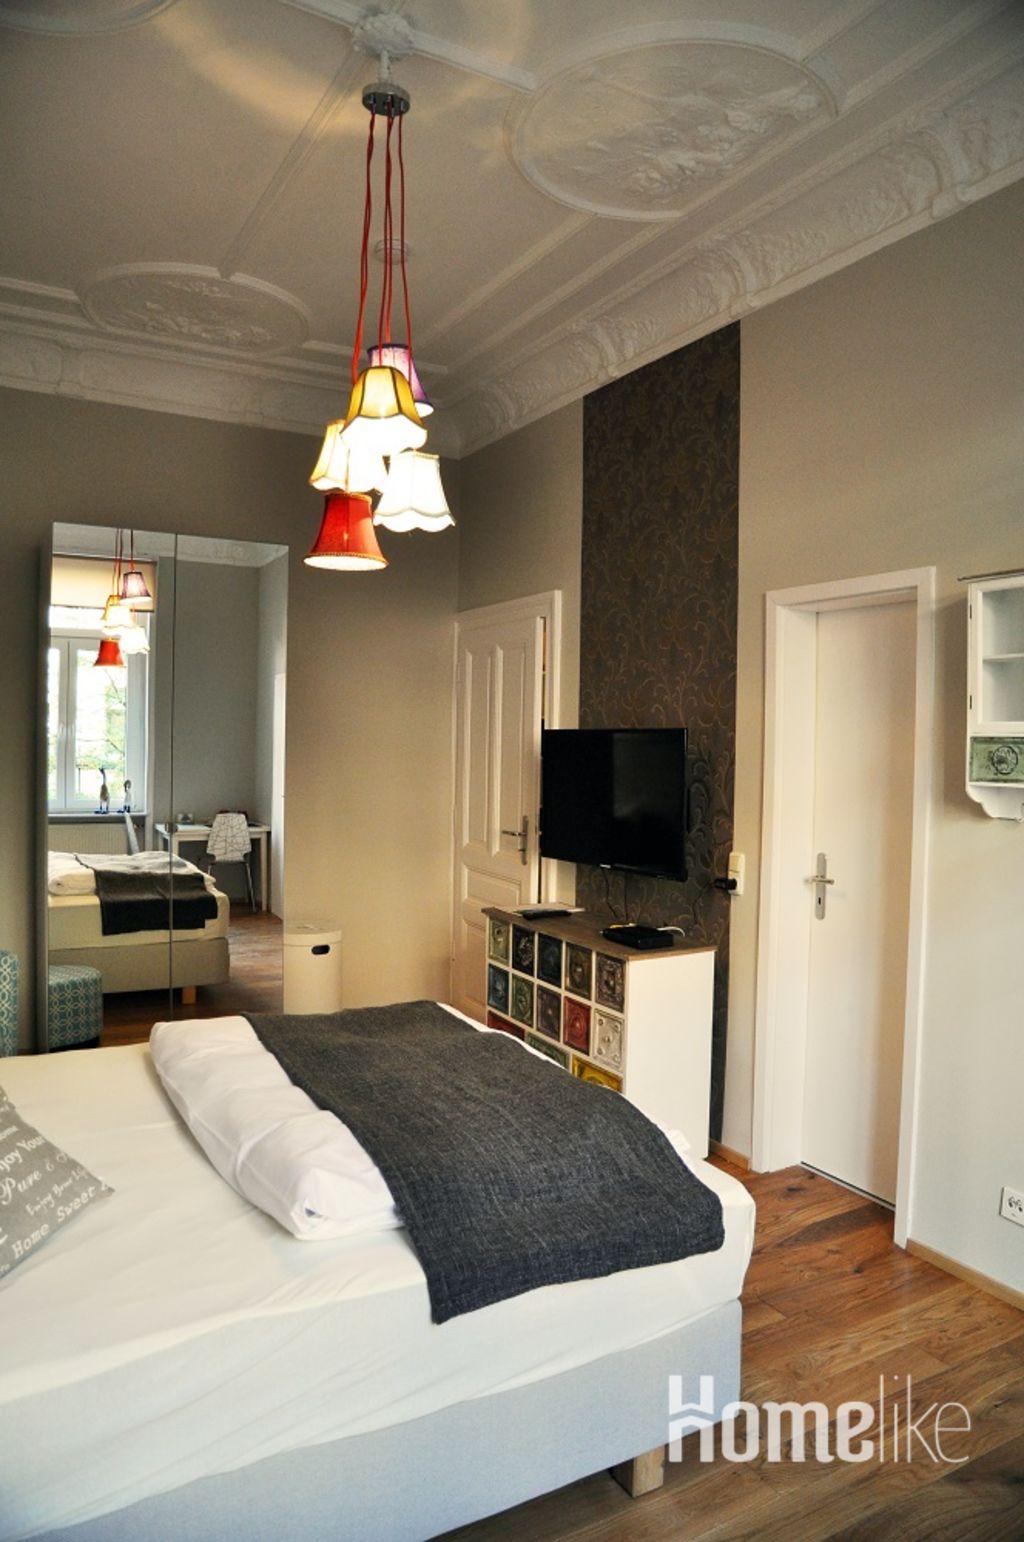 image 9 furnished 1 bedroom Apartment for rent in Sachsenhausen-Nord, Frankfurt